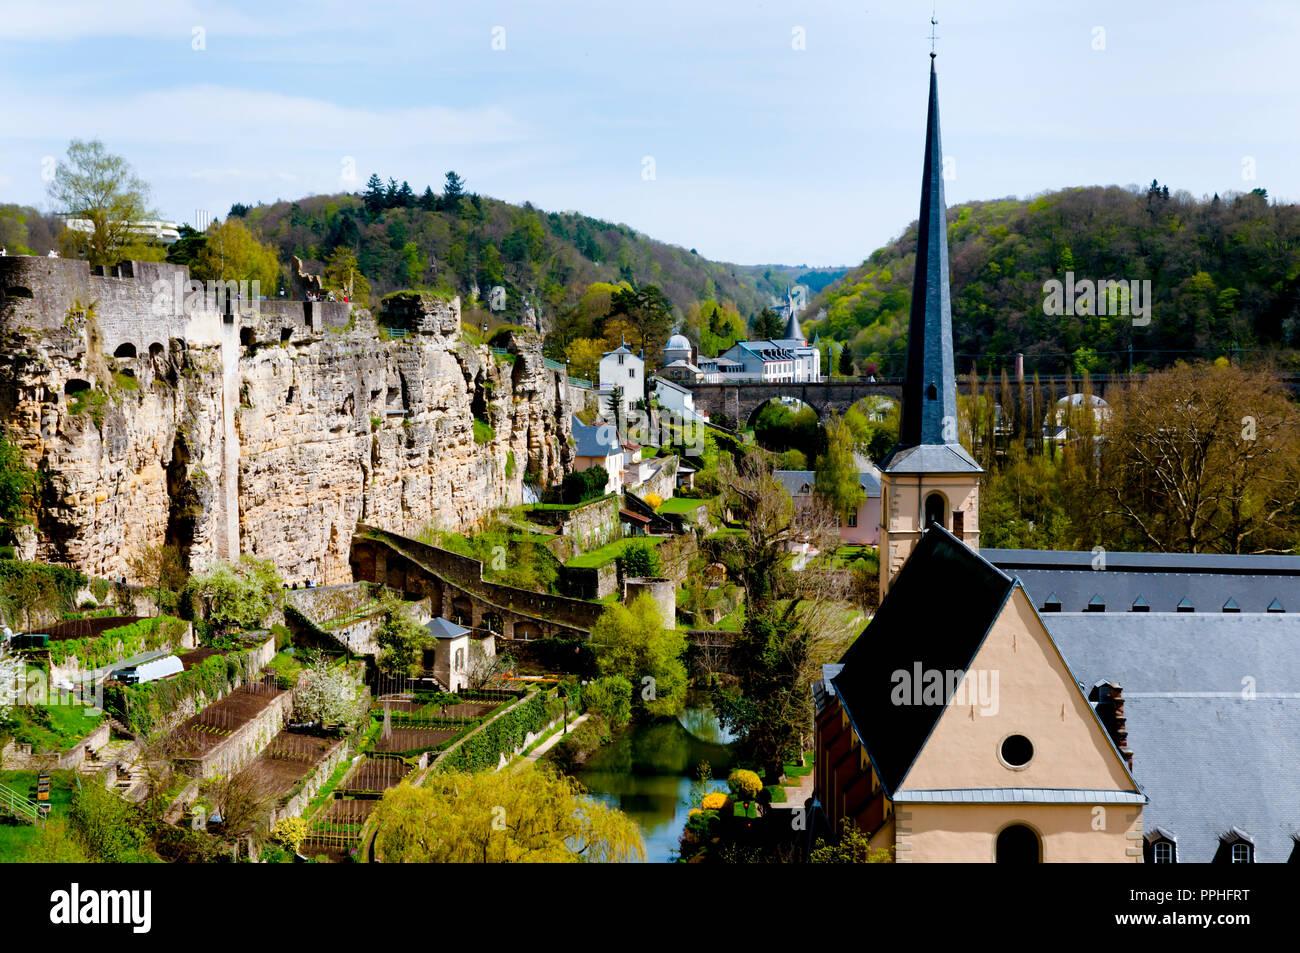 Neumünster Abbey - Luxemburg Stadt Stockbild